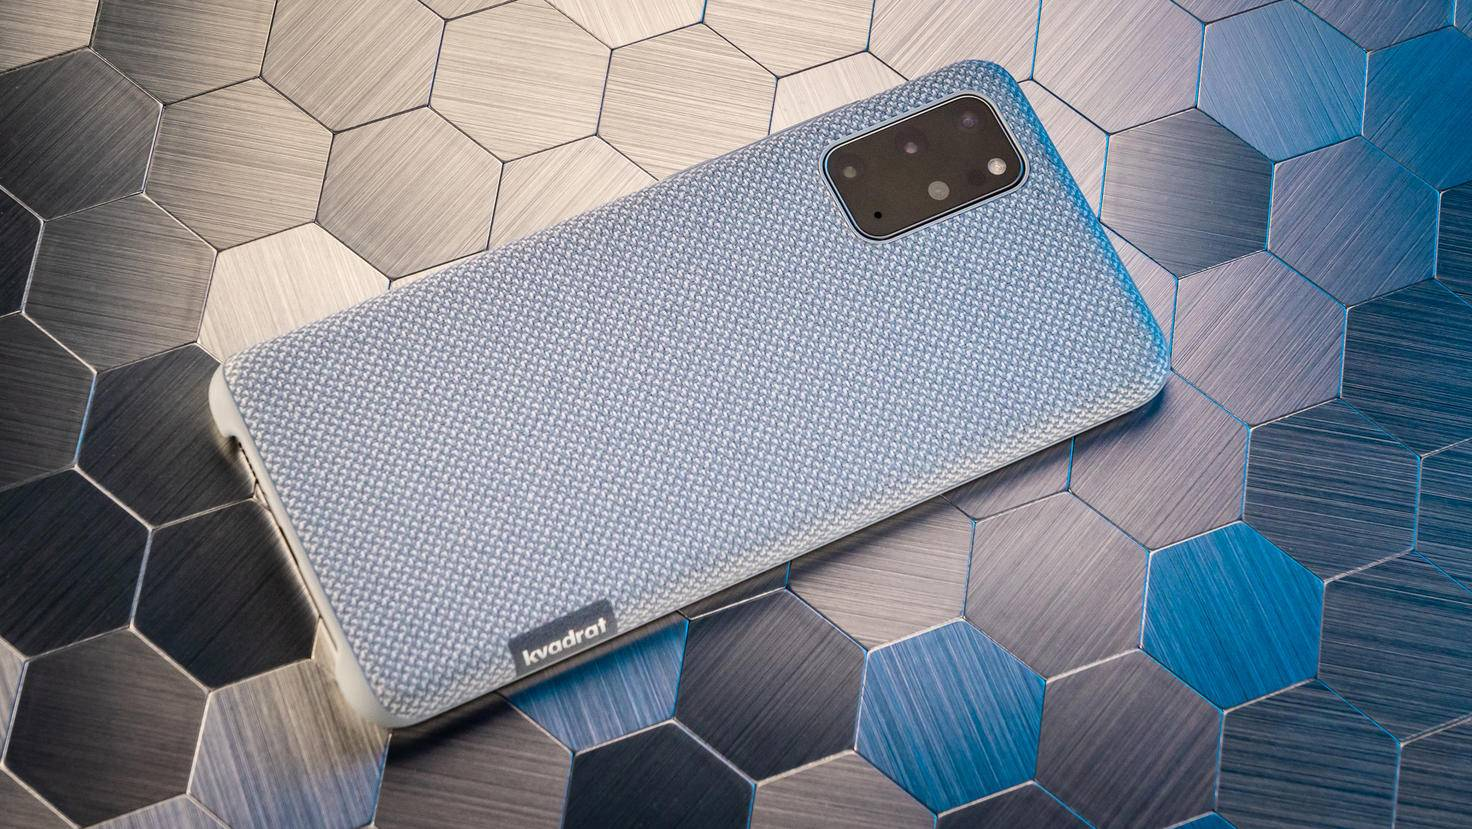 Samsung-Galaxy-S20-Plus-04